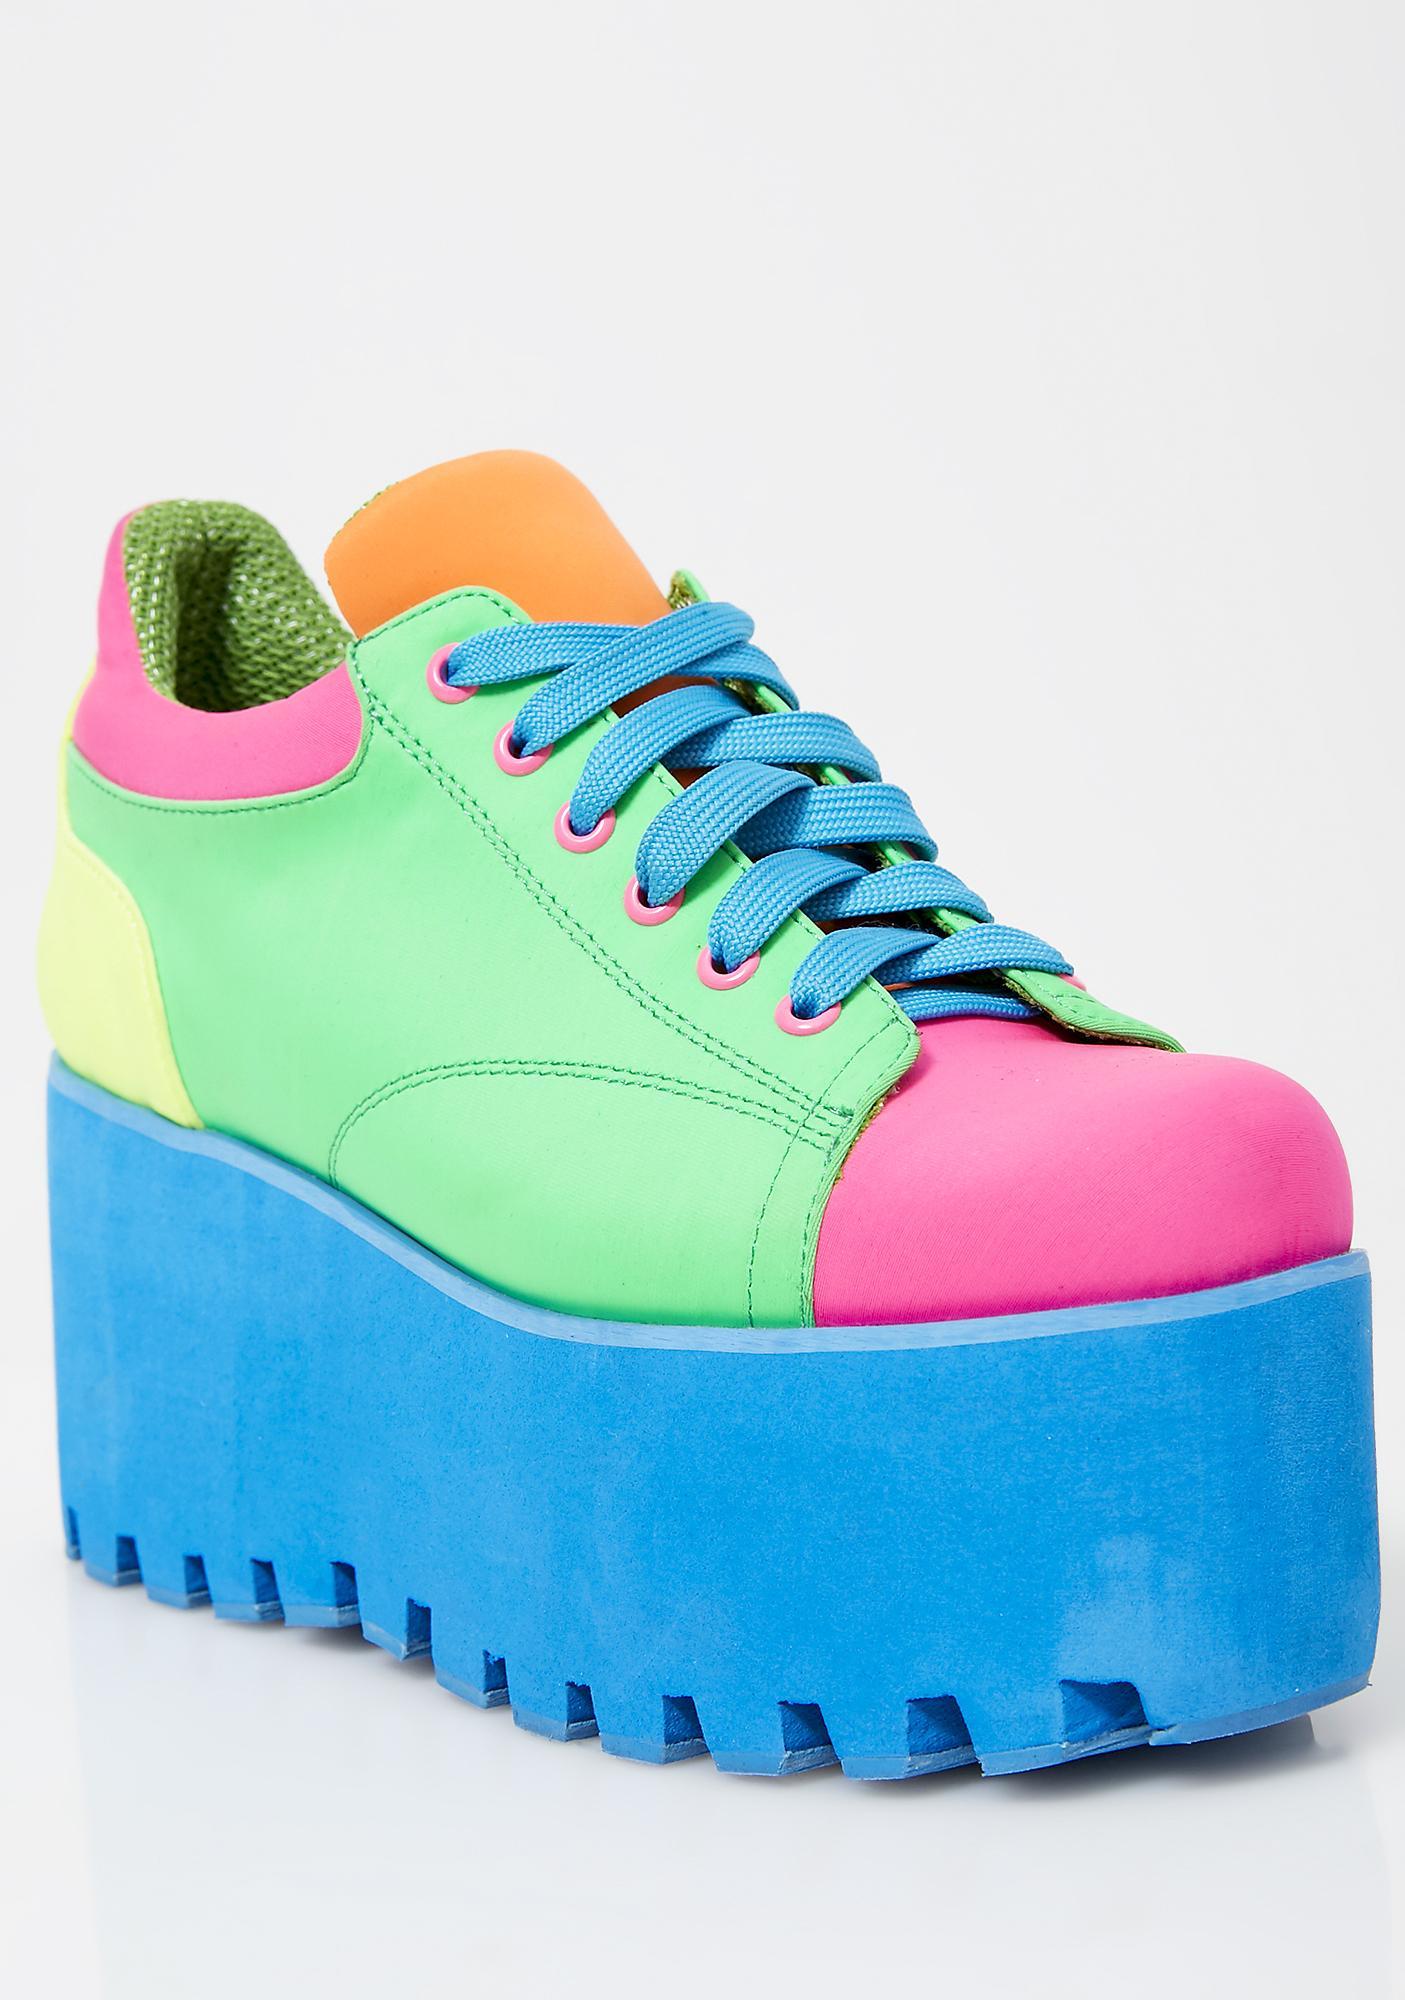 Current Mood Kandi Rush Platform Sneakers